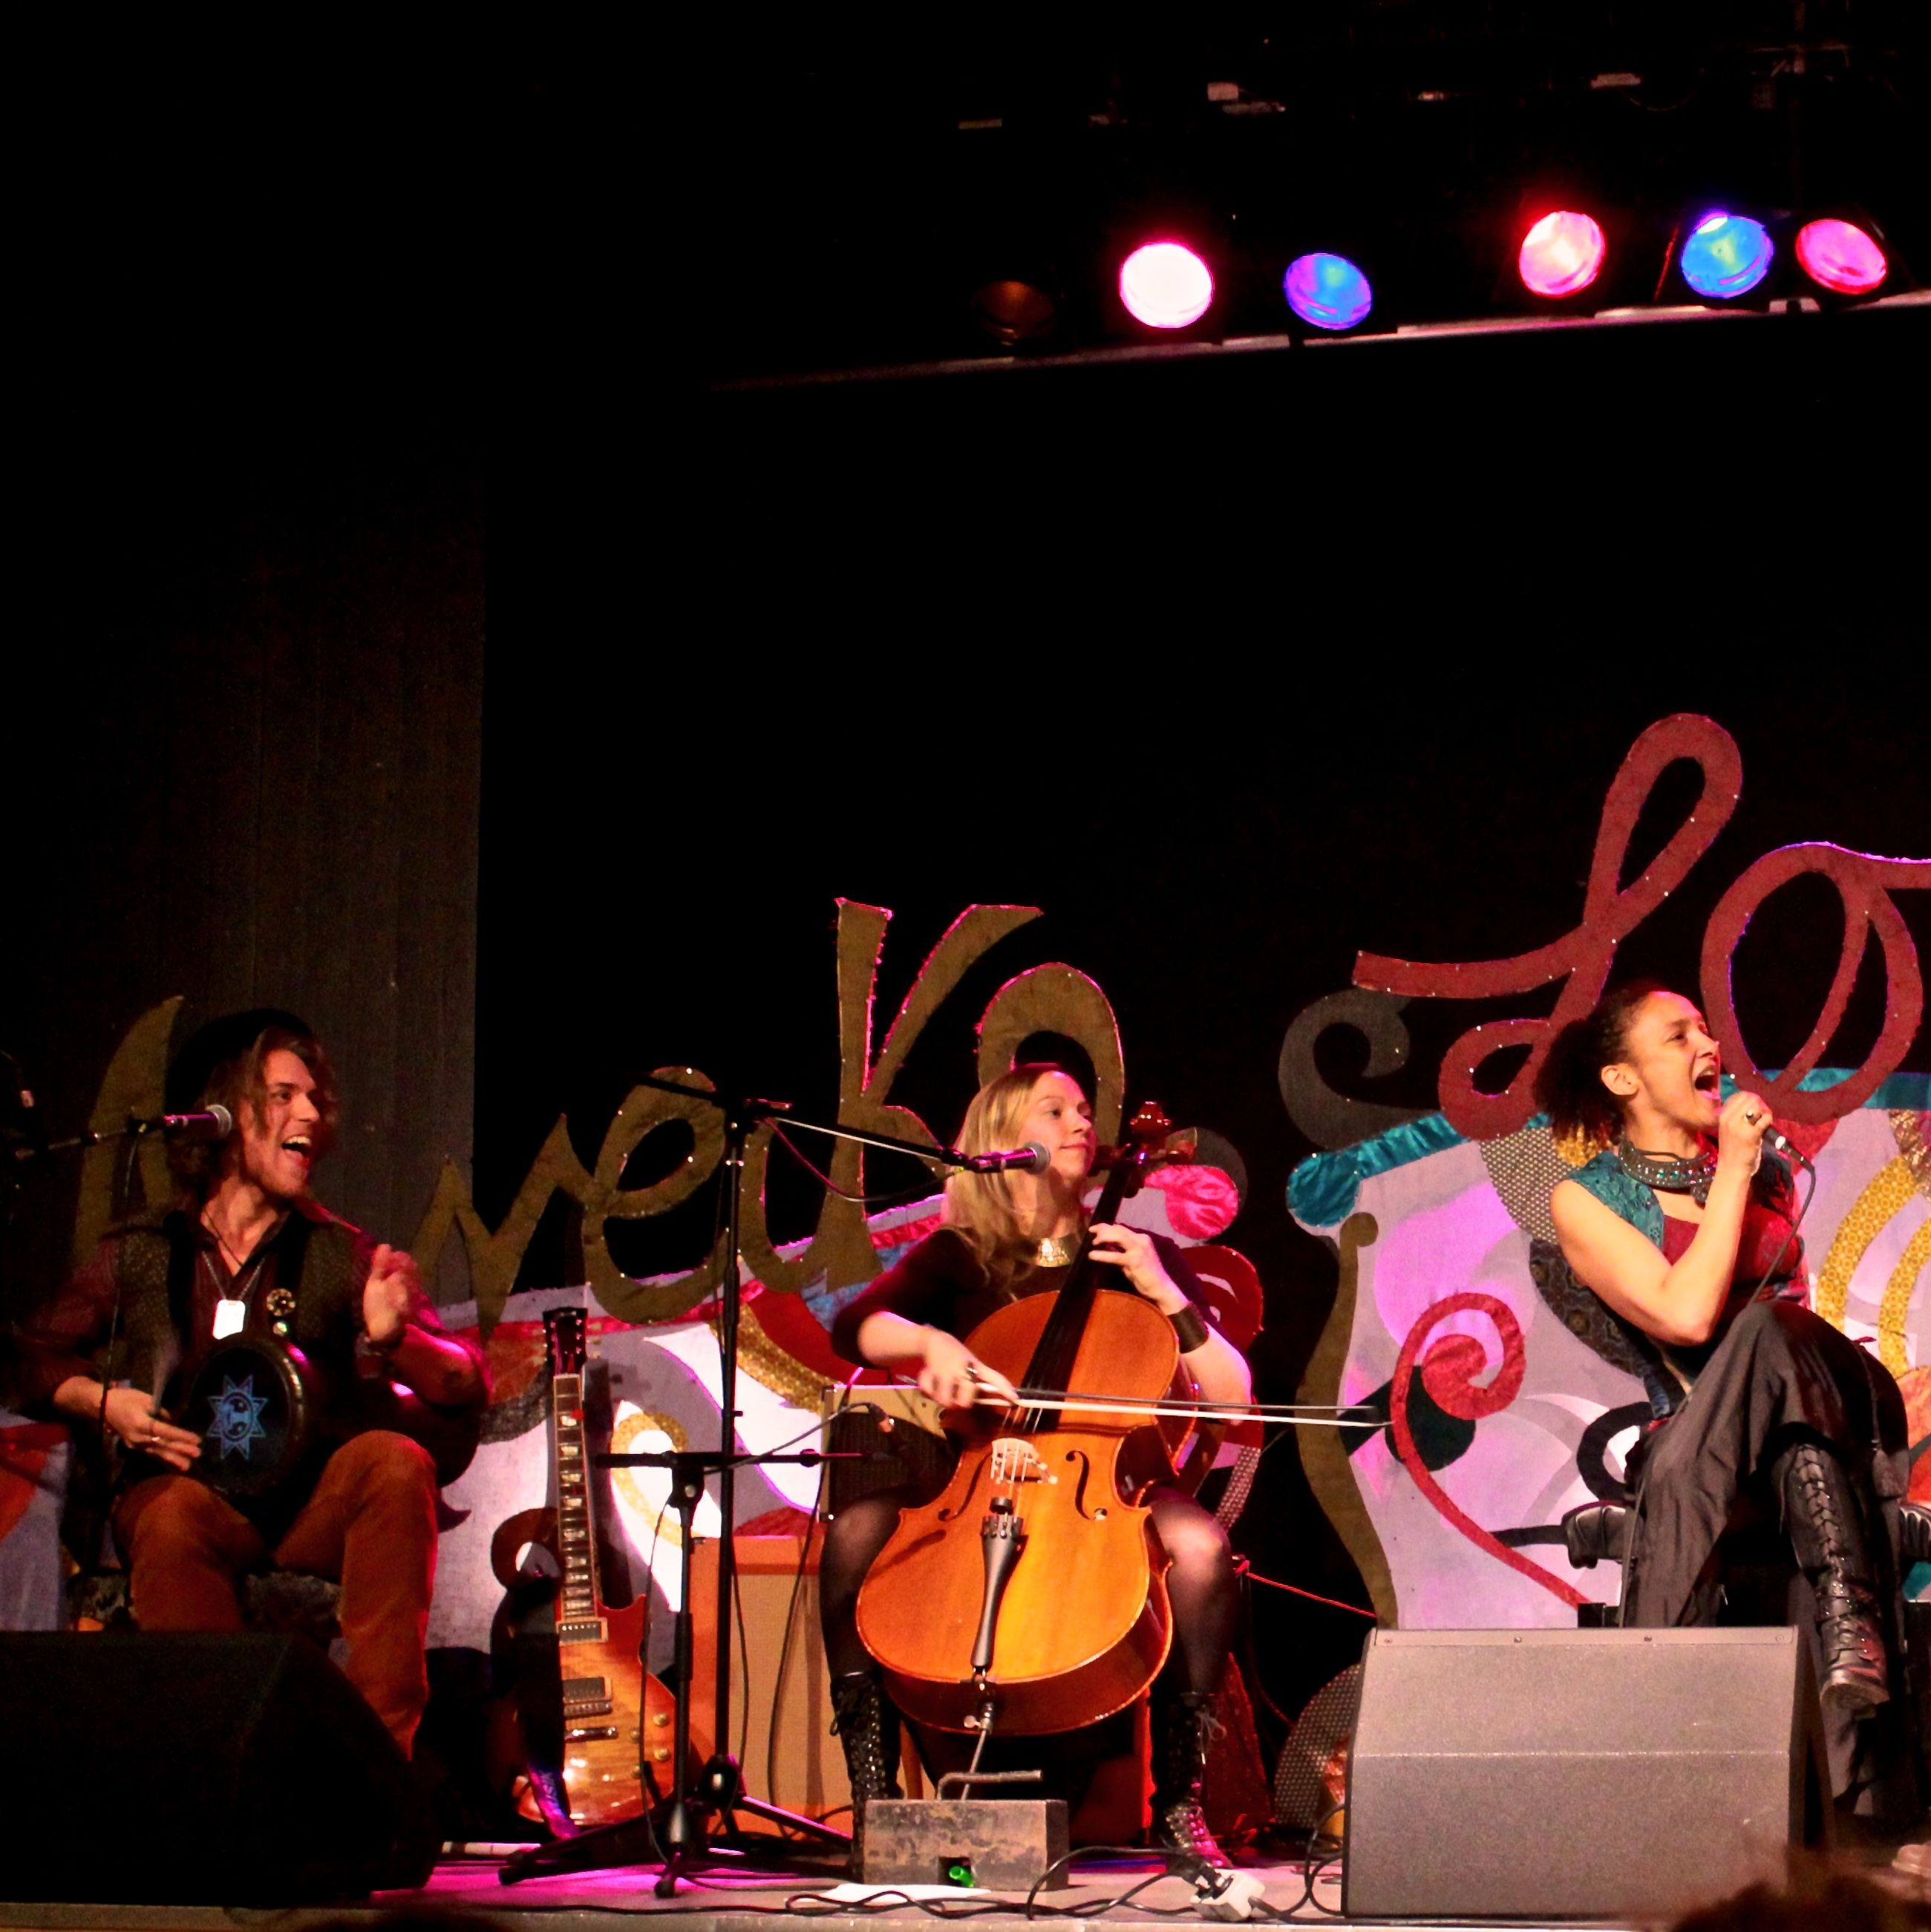 Awake love orchestra vkcgol